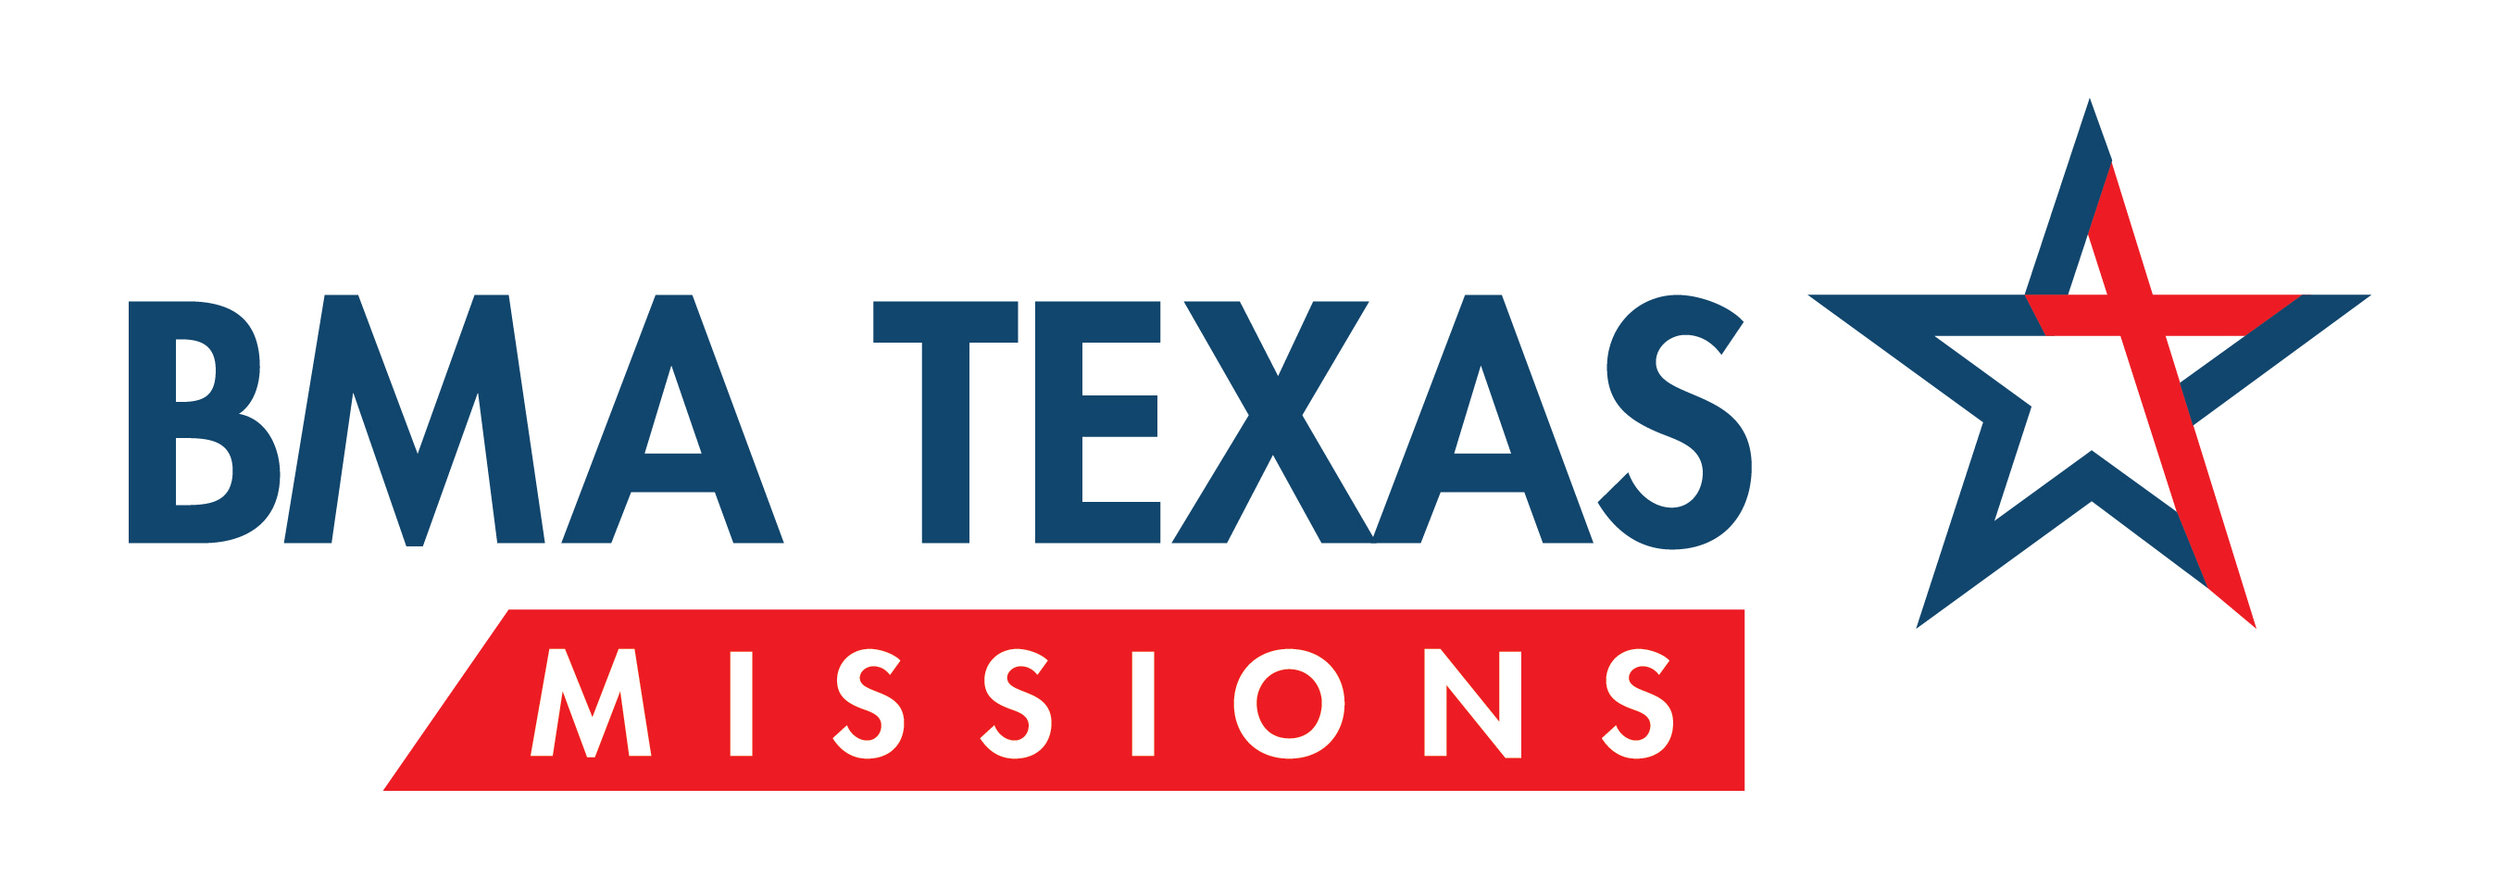 BMAT_Missions_logo.jpg